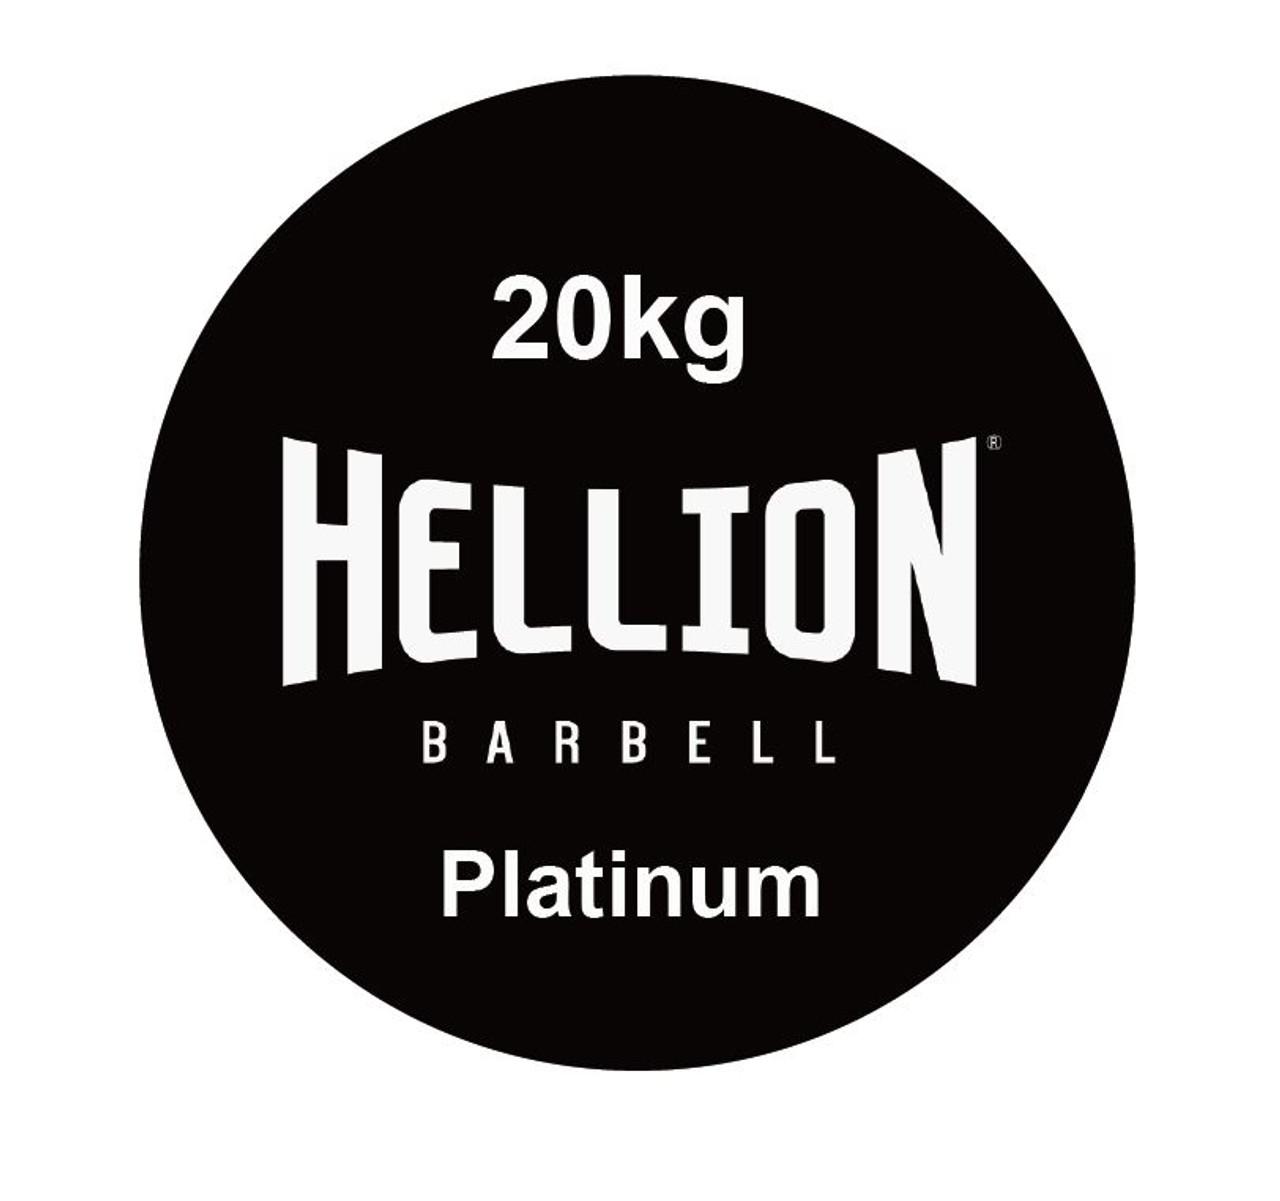 Hellion Platinum Men's Needle Bearing Olympic Barbell (1,500lbs / 180,000PSI) - Chrome (Hellion Platinum 20 - Chrome)